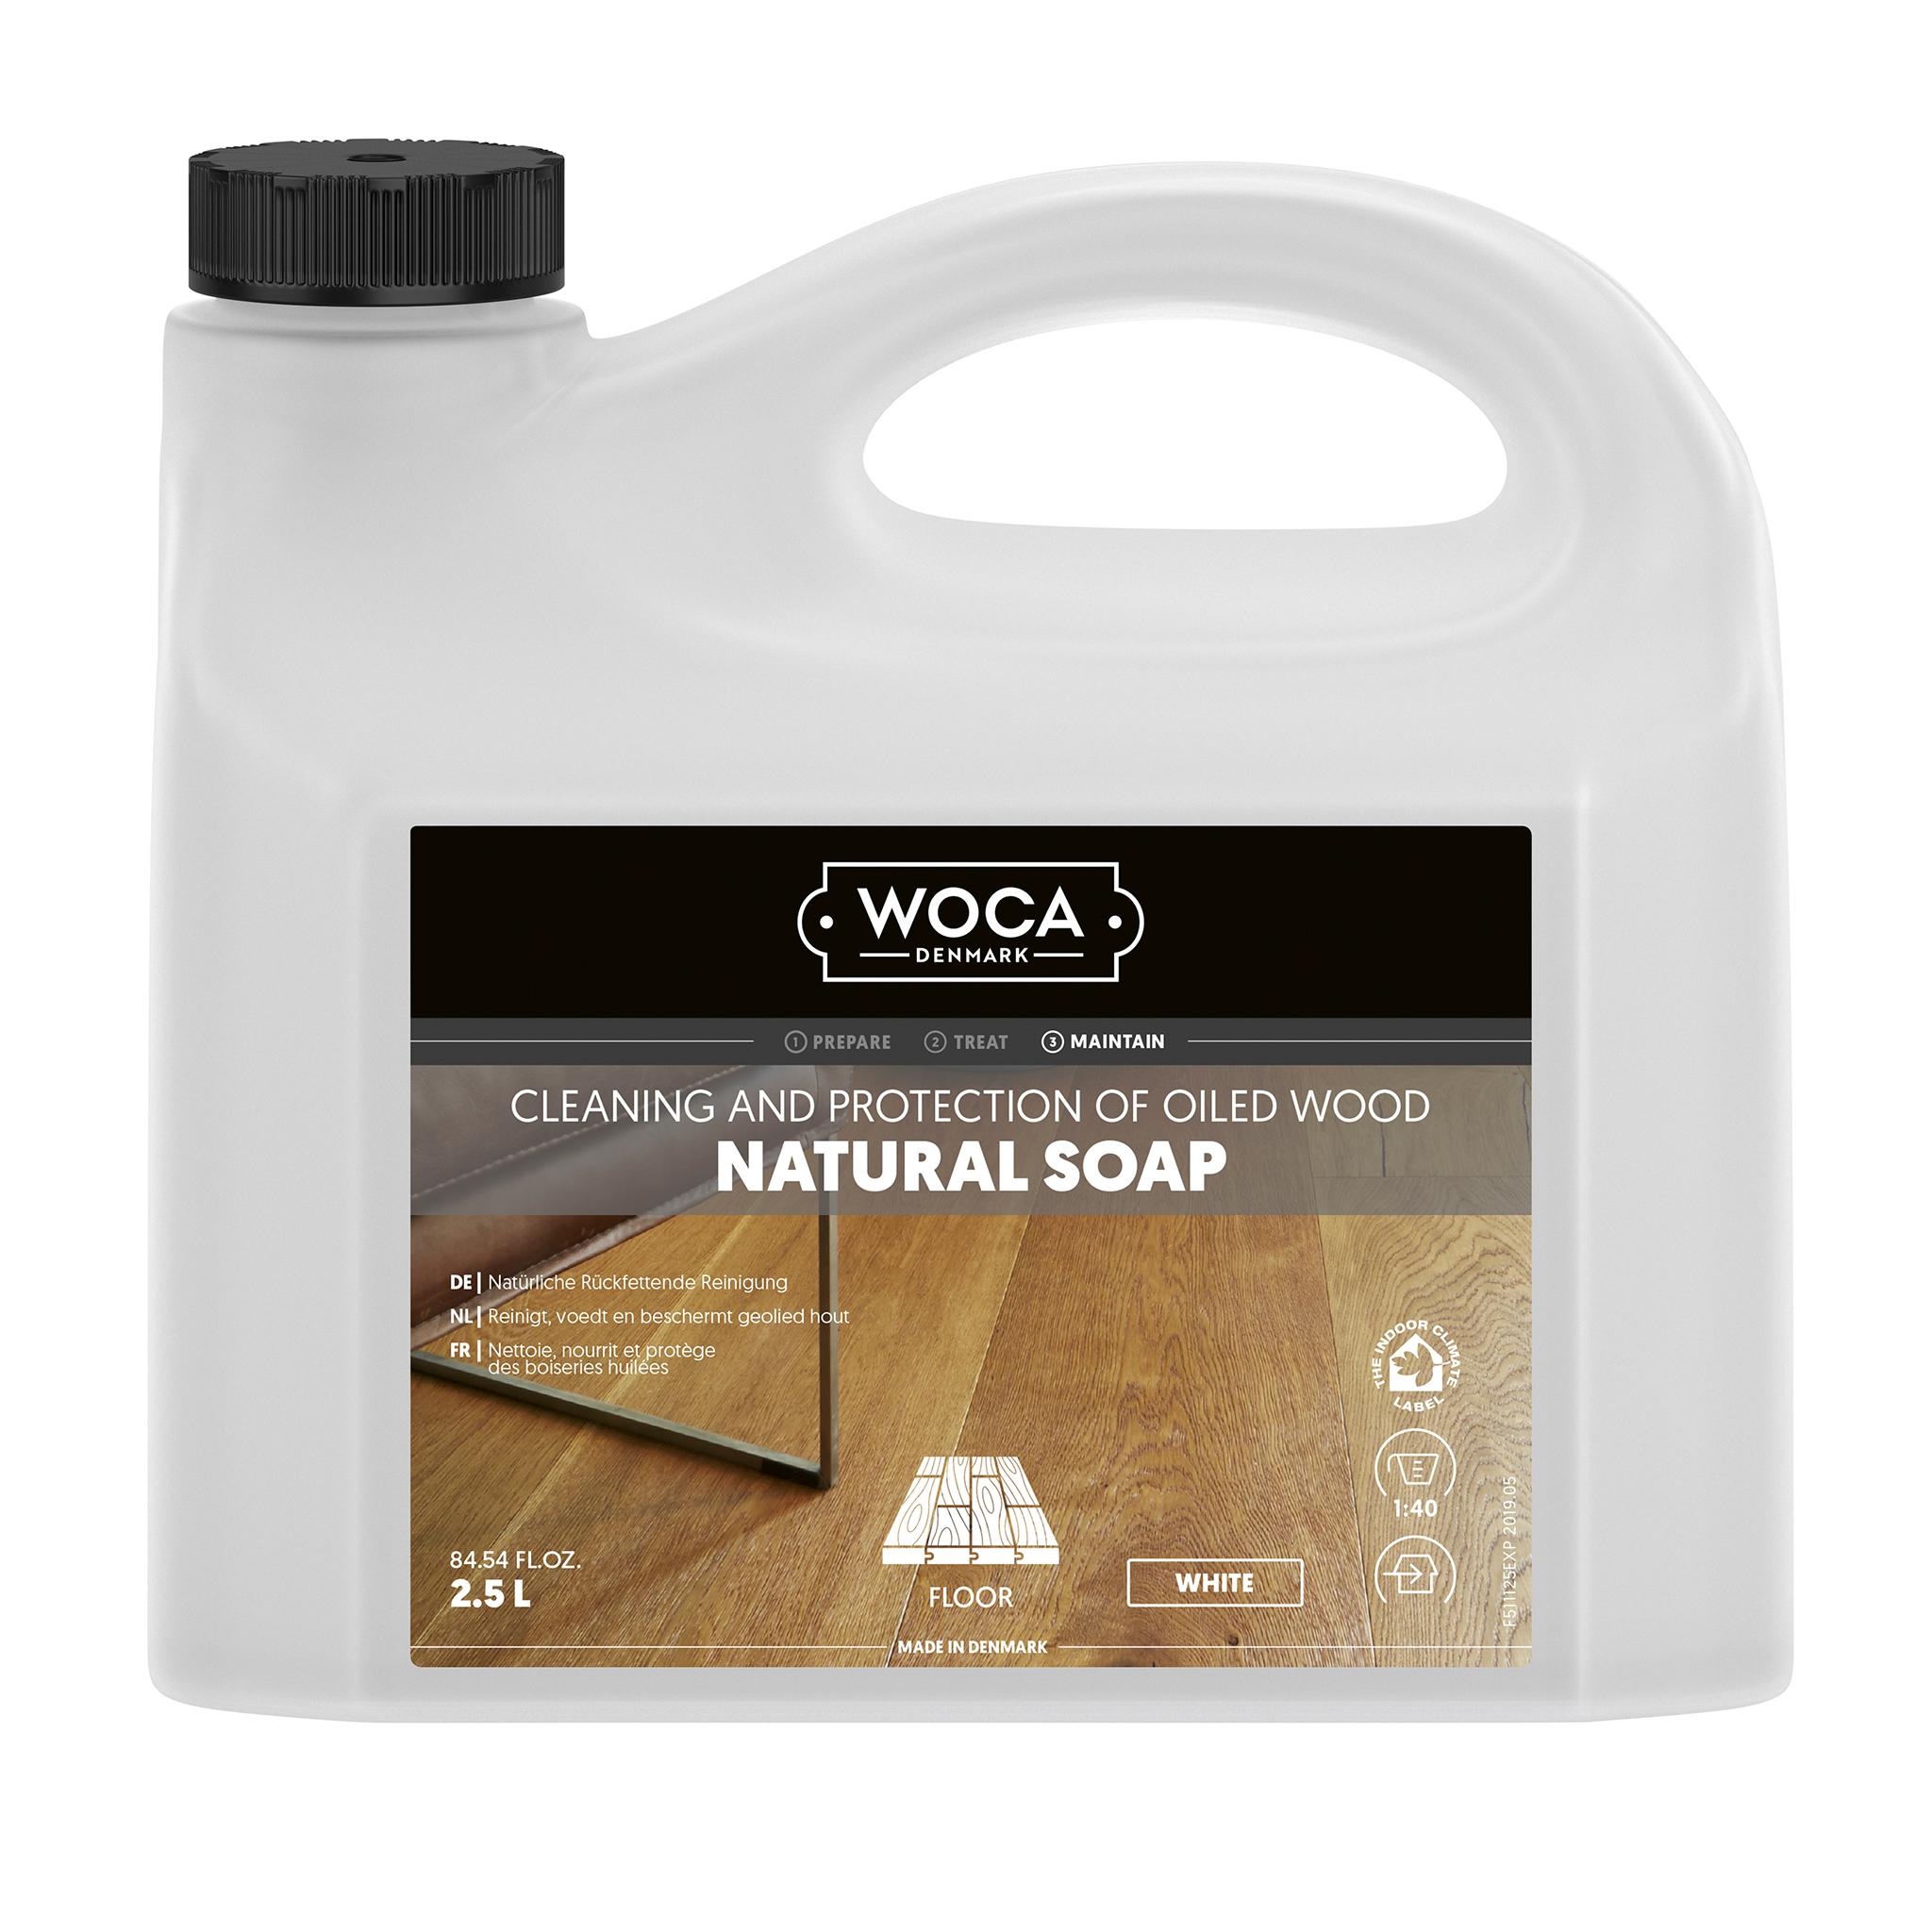 WOCA Holzbodenseife weiß 2,5 Ltr.